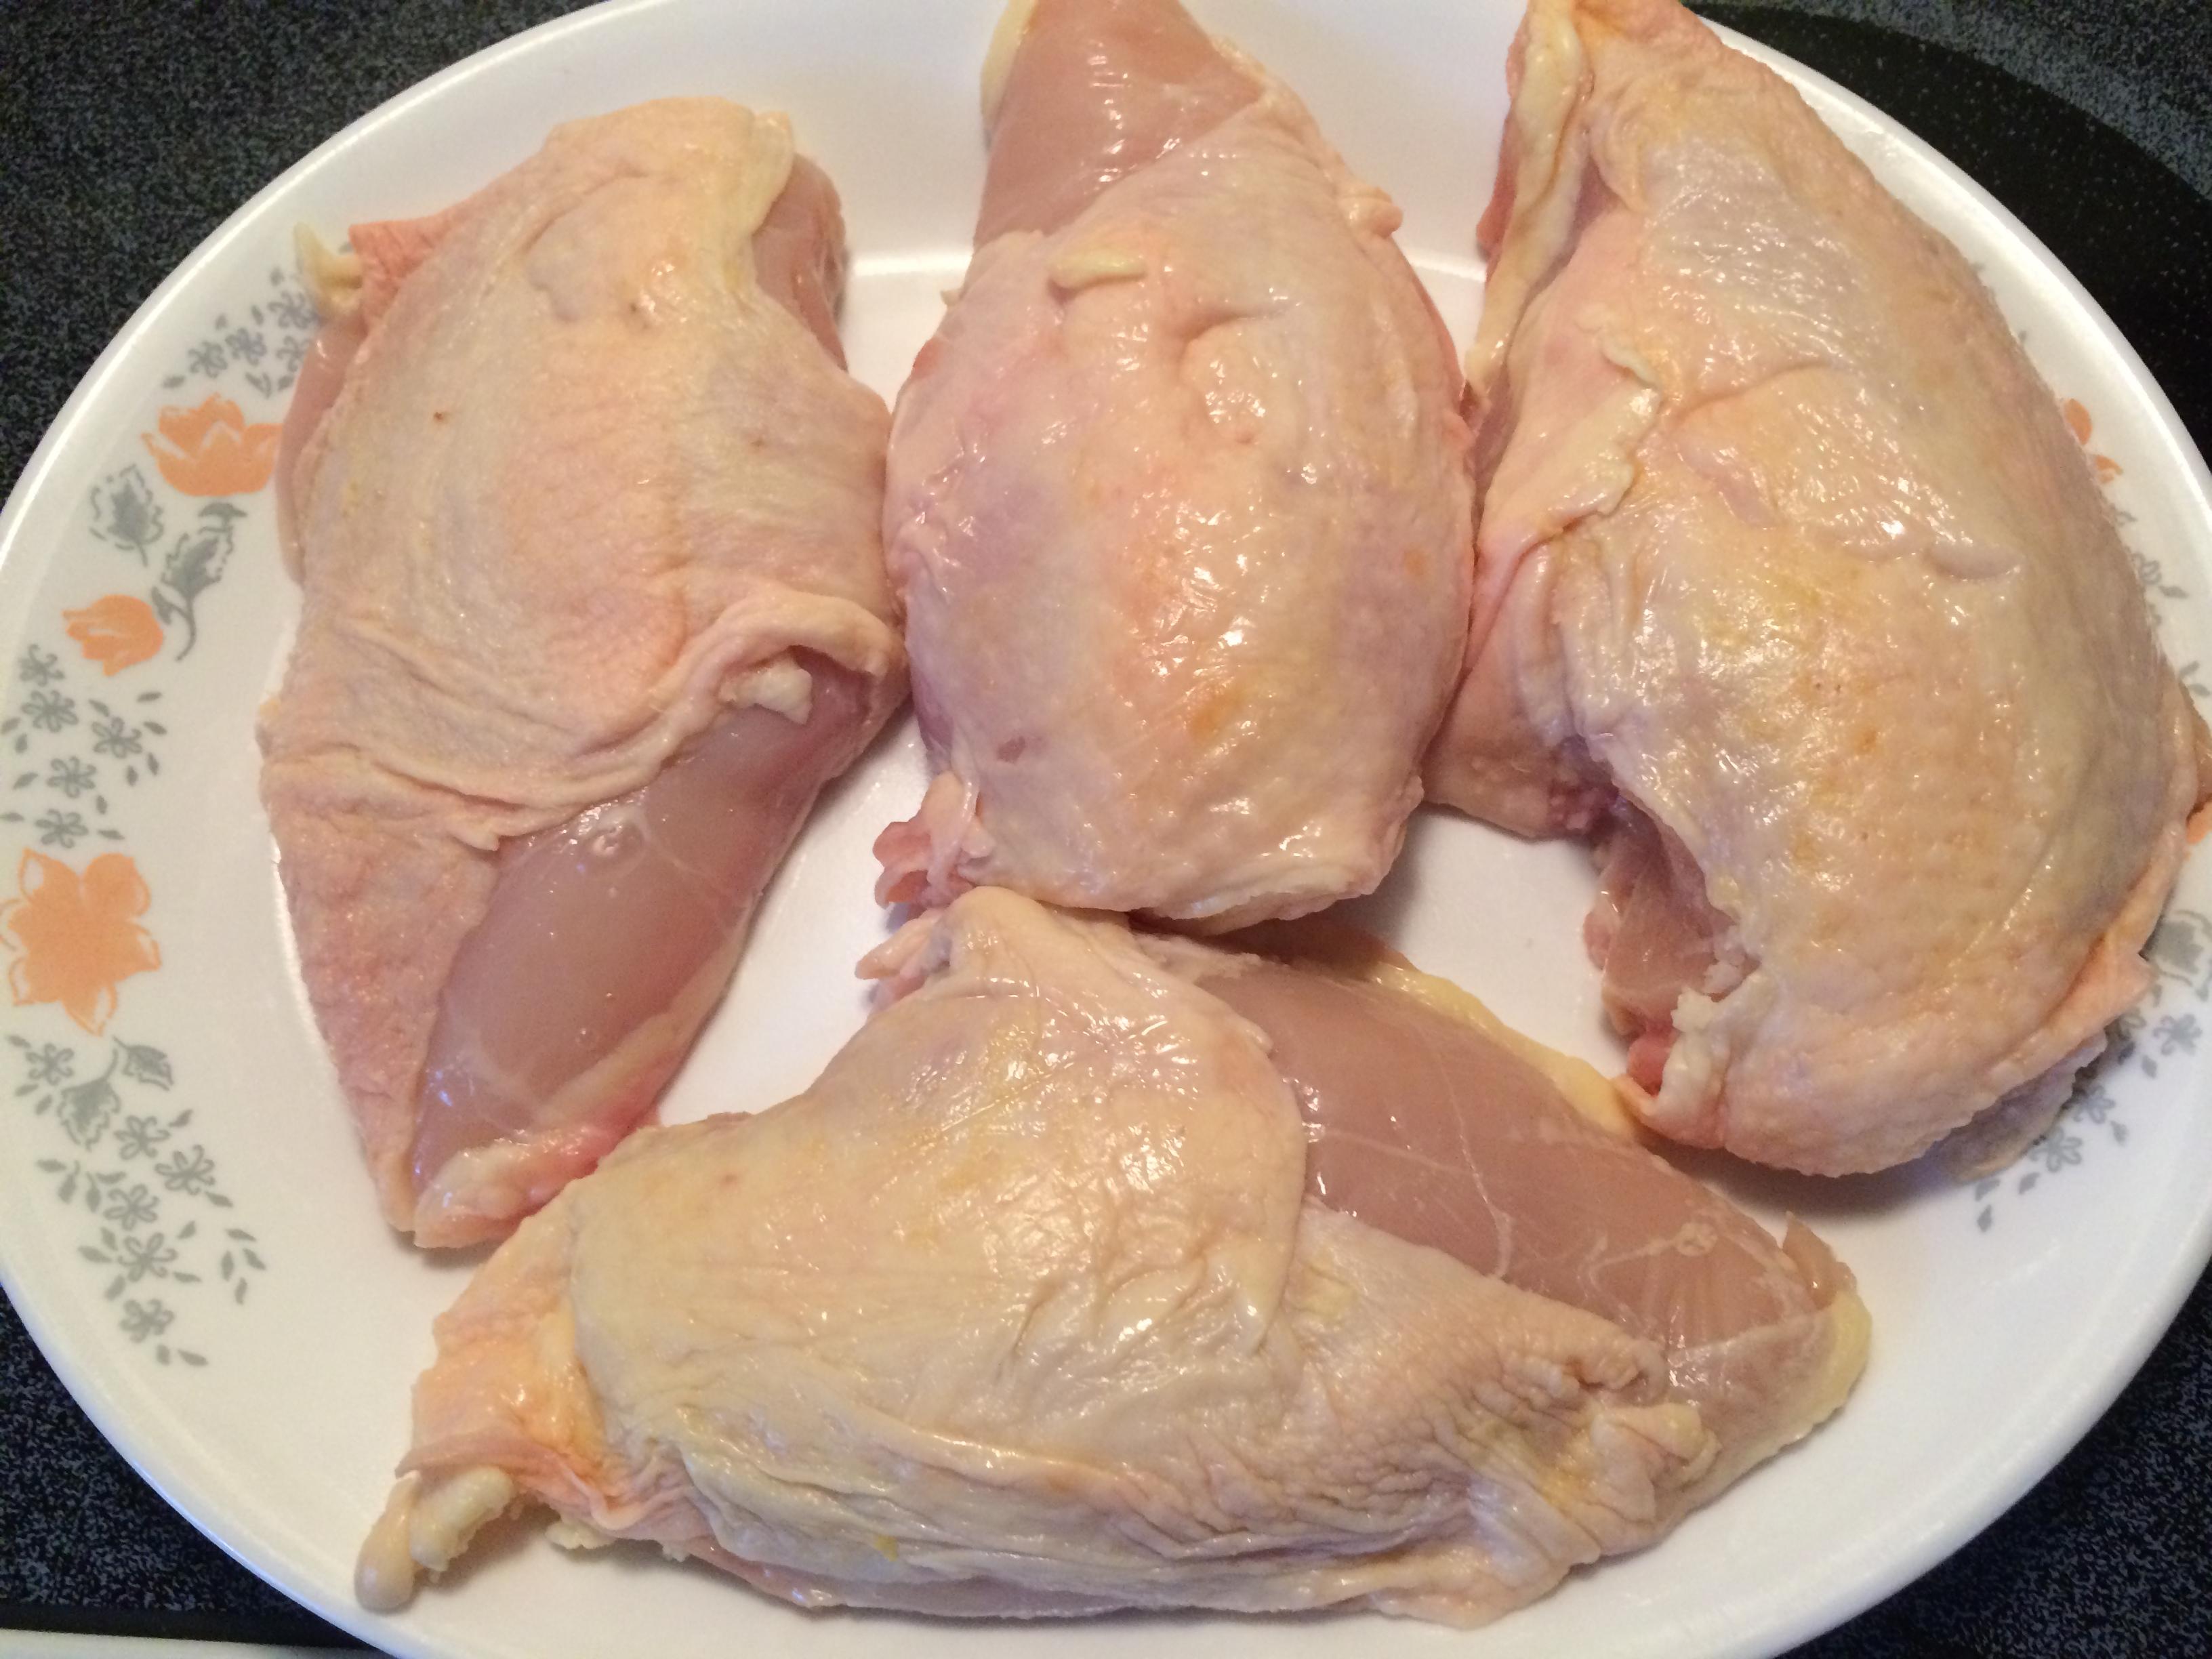 Skin-On Boneless Chicken Breasts